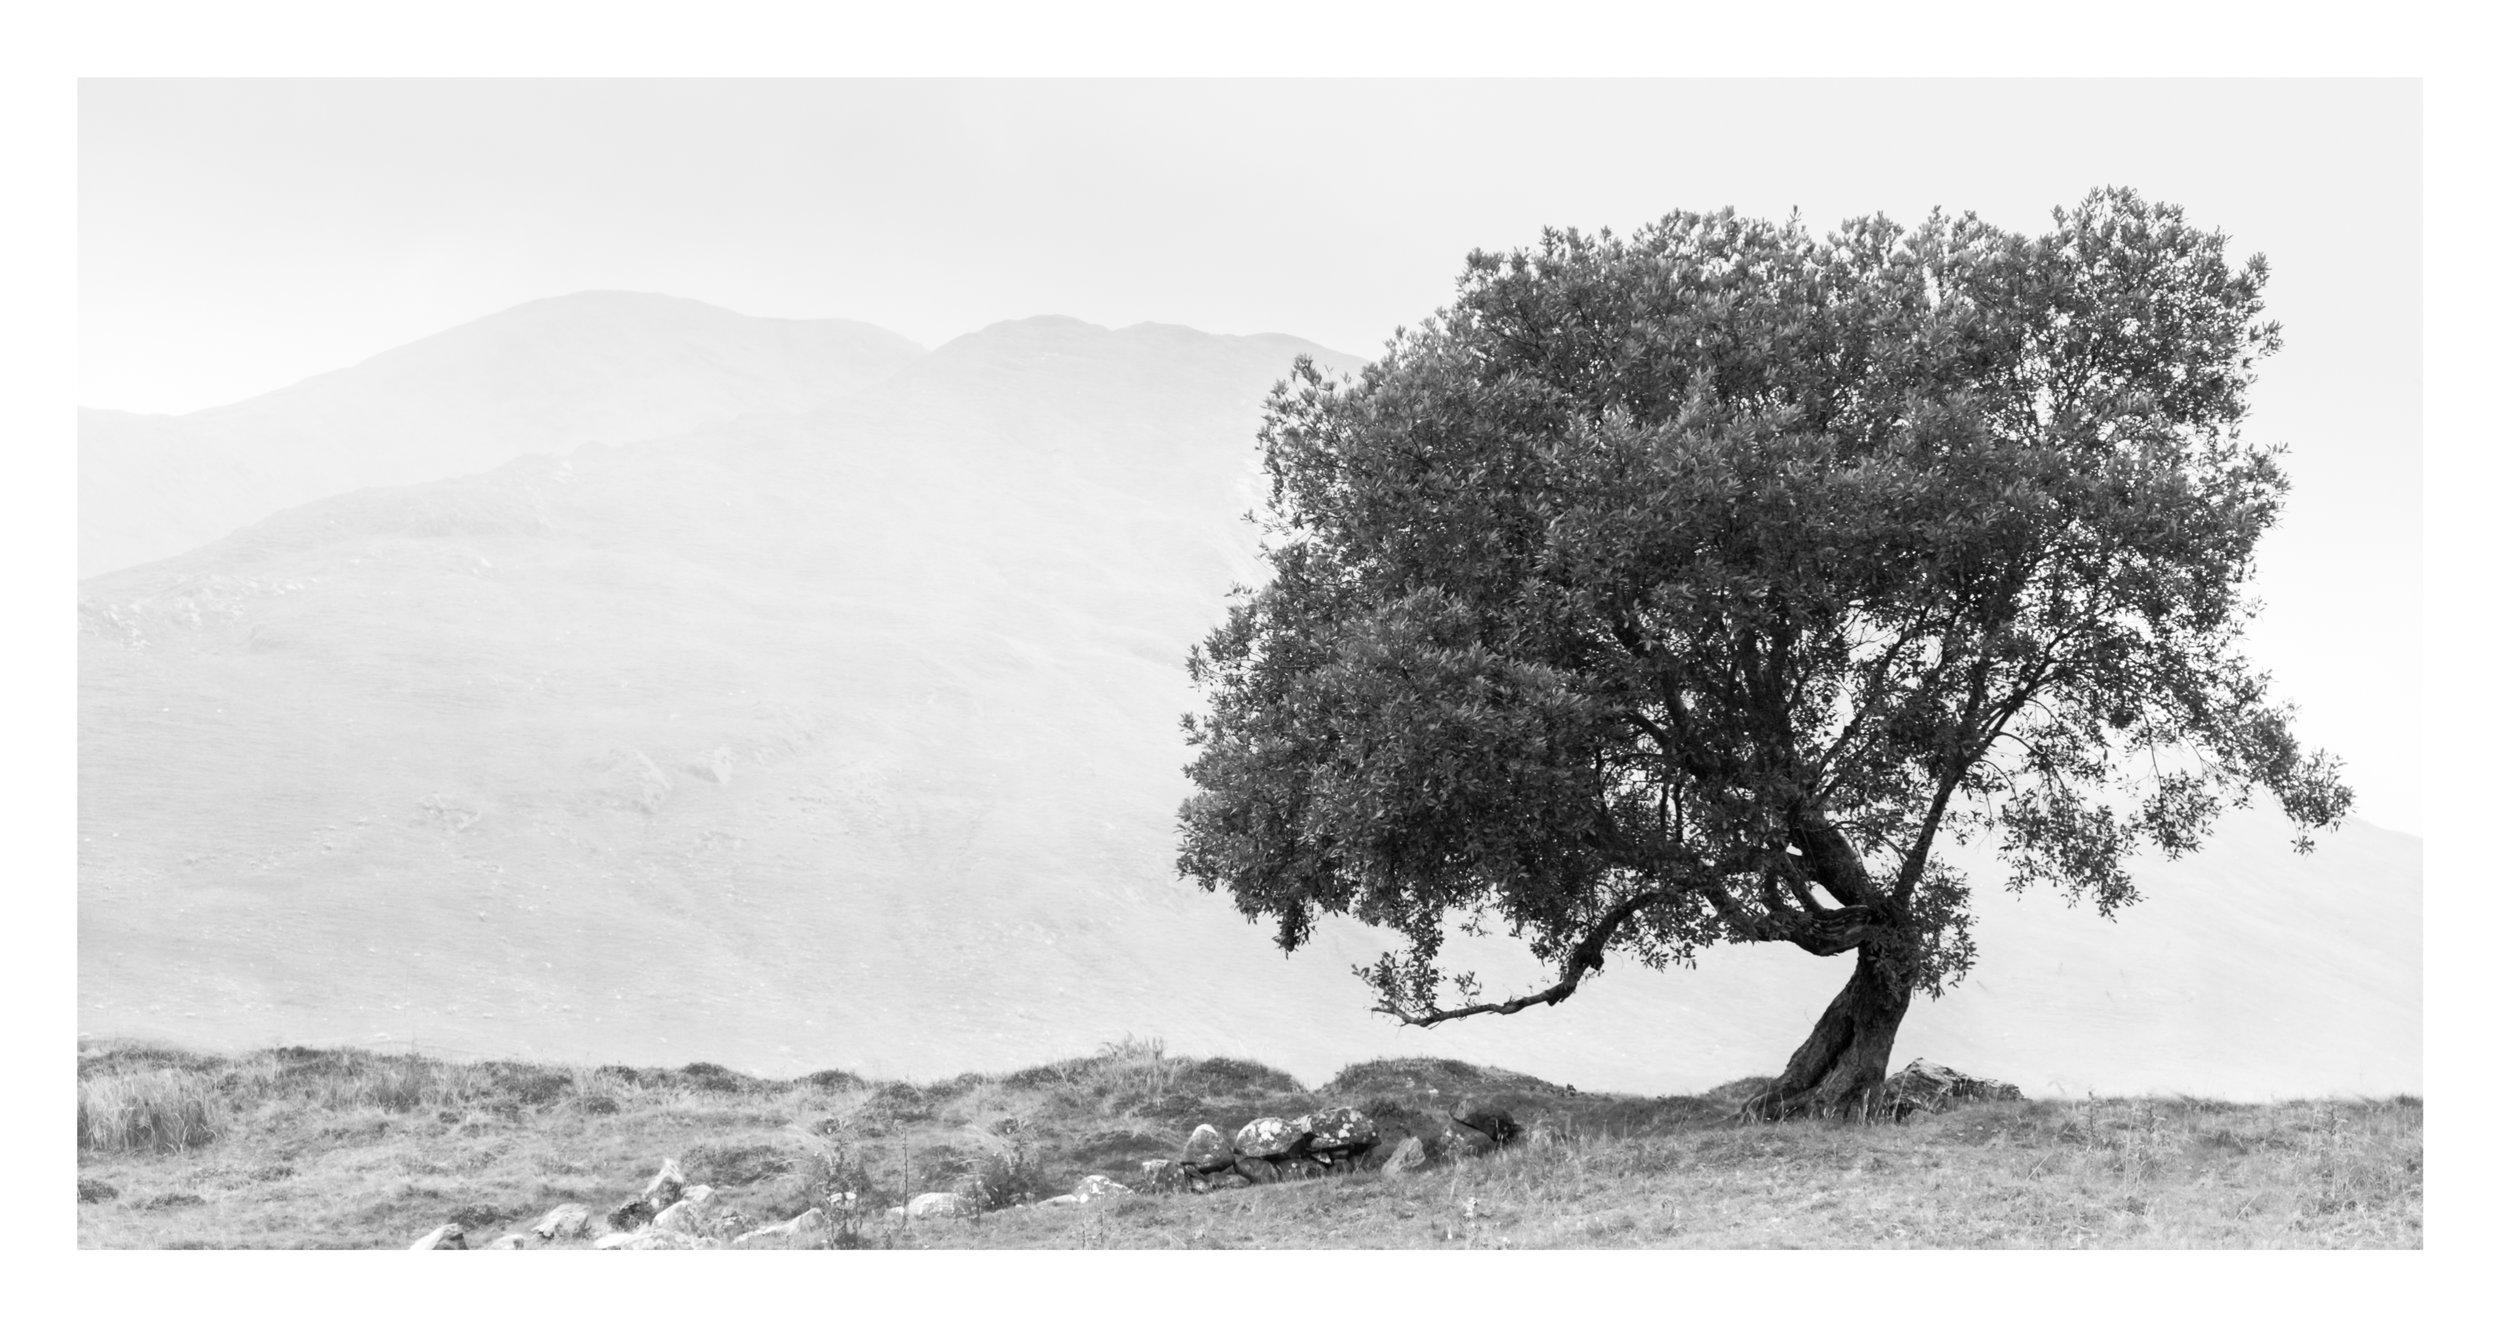 24 Lough naFooey tree.jpg